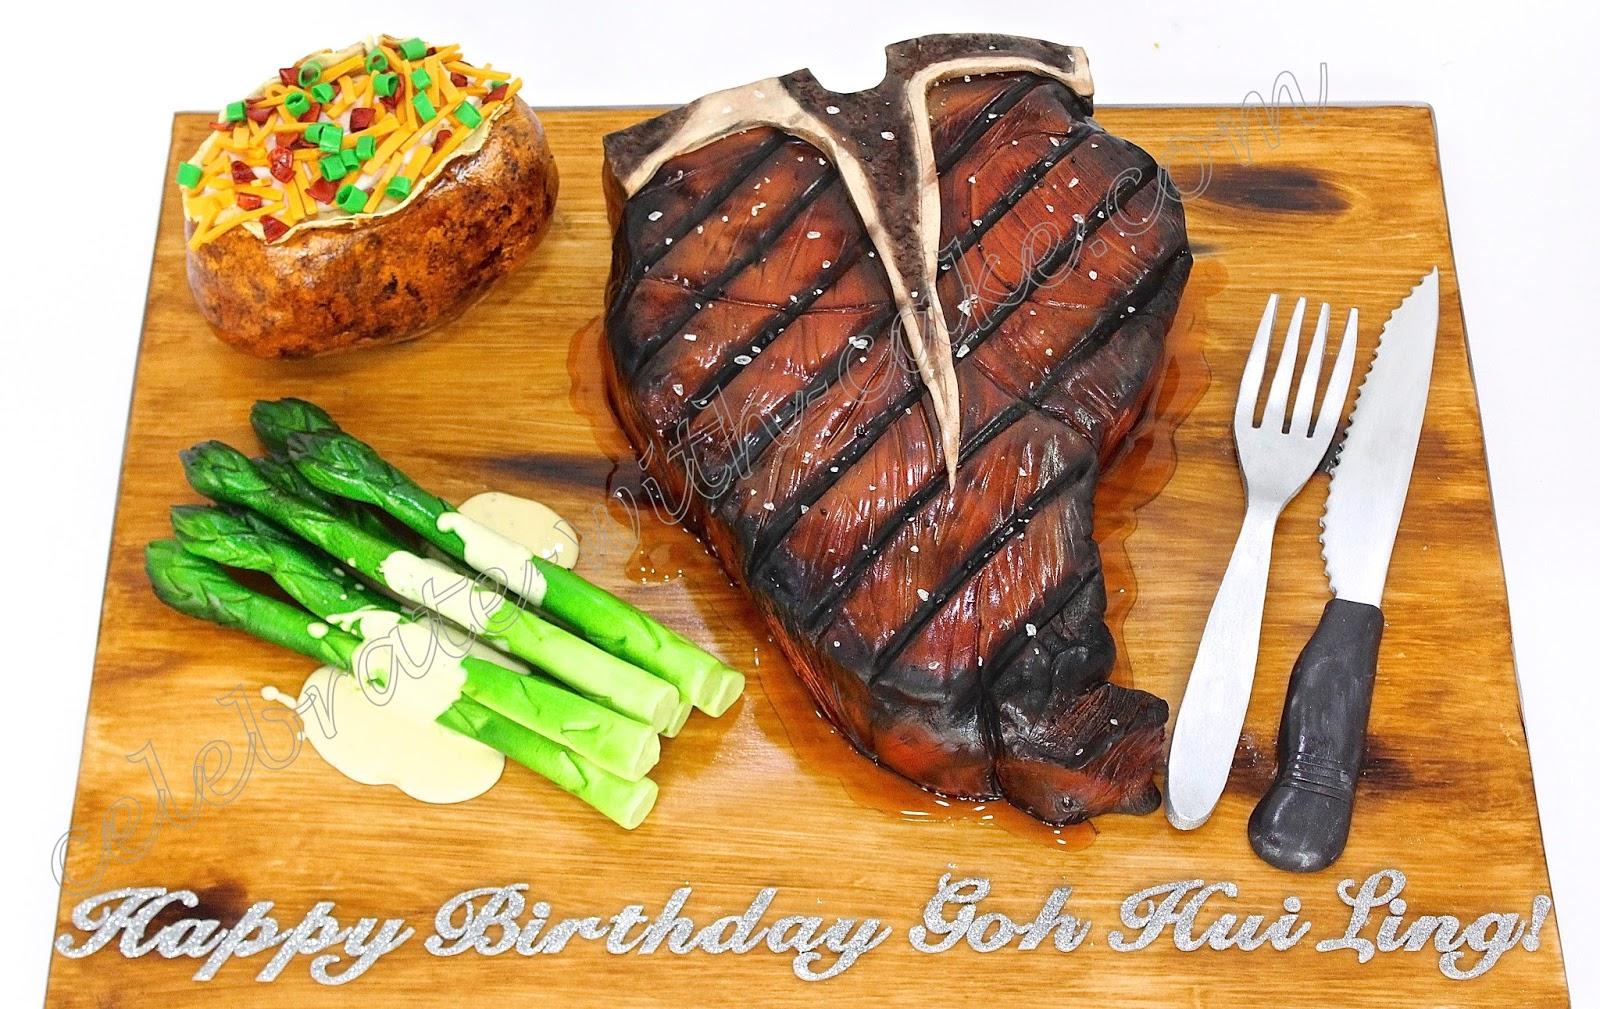 Wondrous Celebrate With Cake T Bone Steak Asparagus And Potato Cake Funny Birthday Cards Online Inifofree Goldxyz